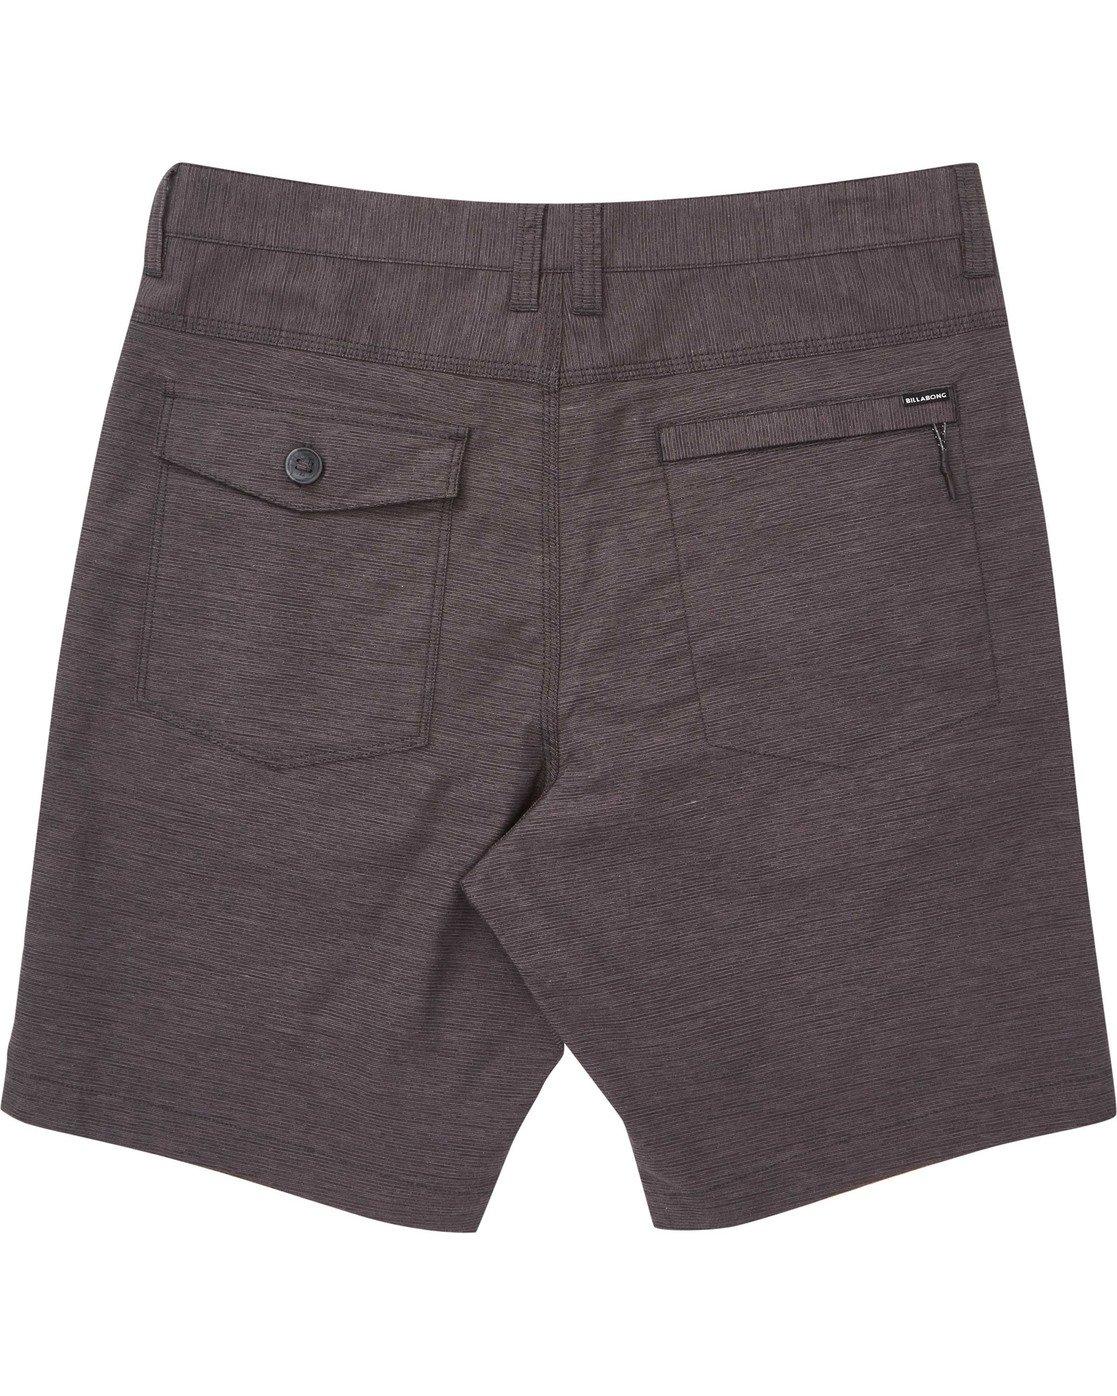 Pants Provided Billabong Pants Size 32 Men's Clothing